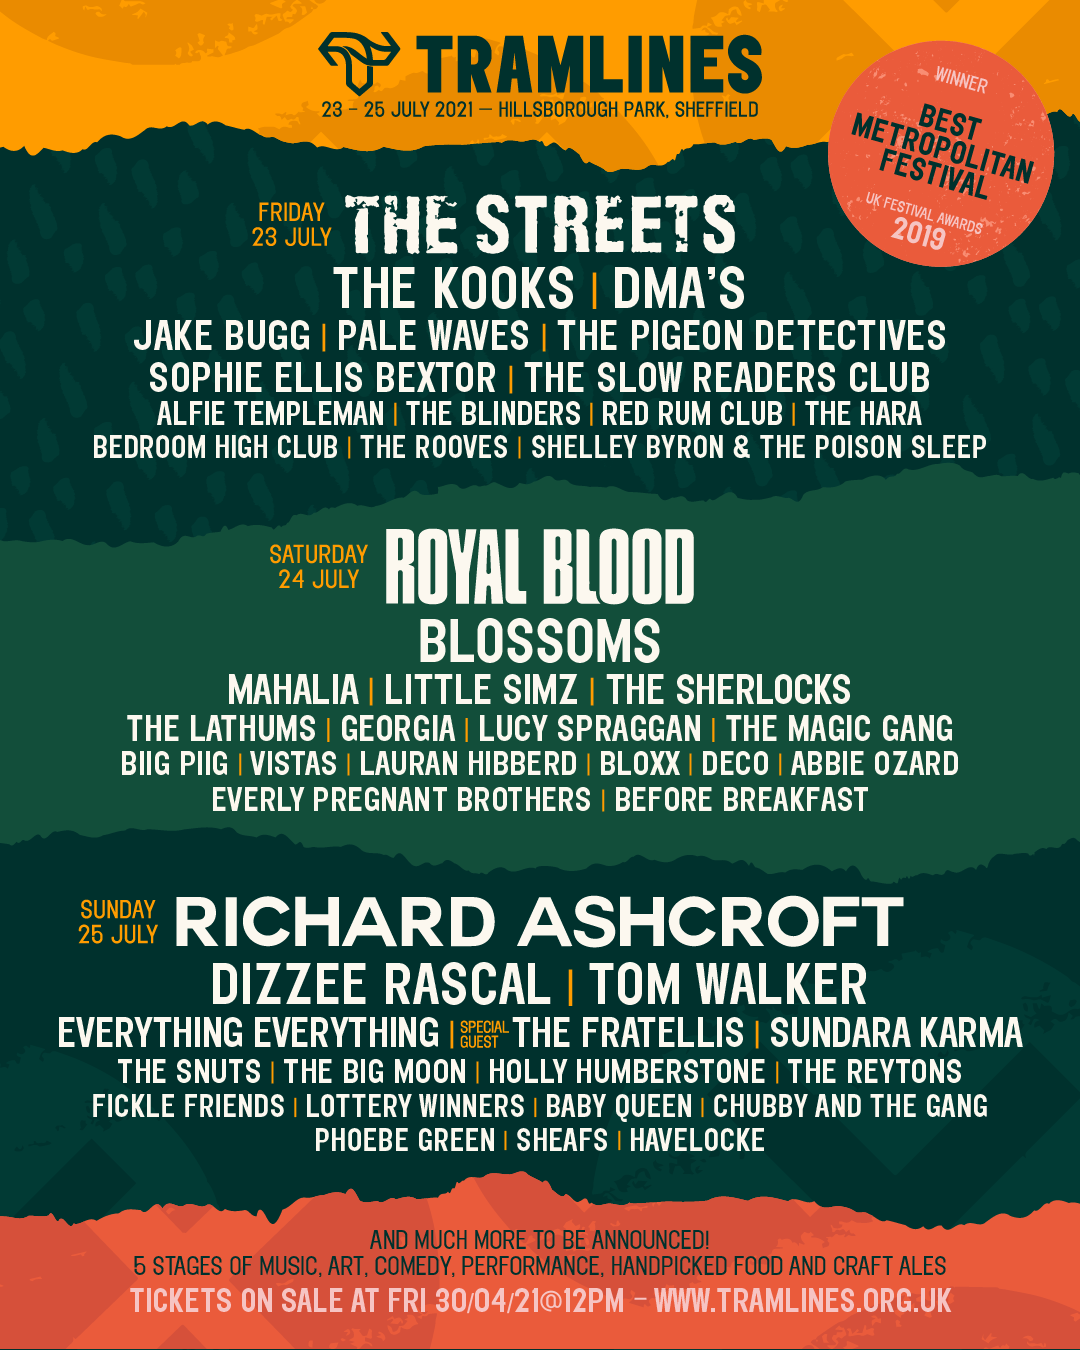 Tramlines sheffield festival 2021 line up